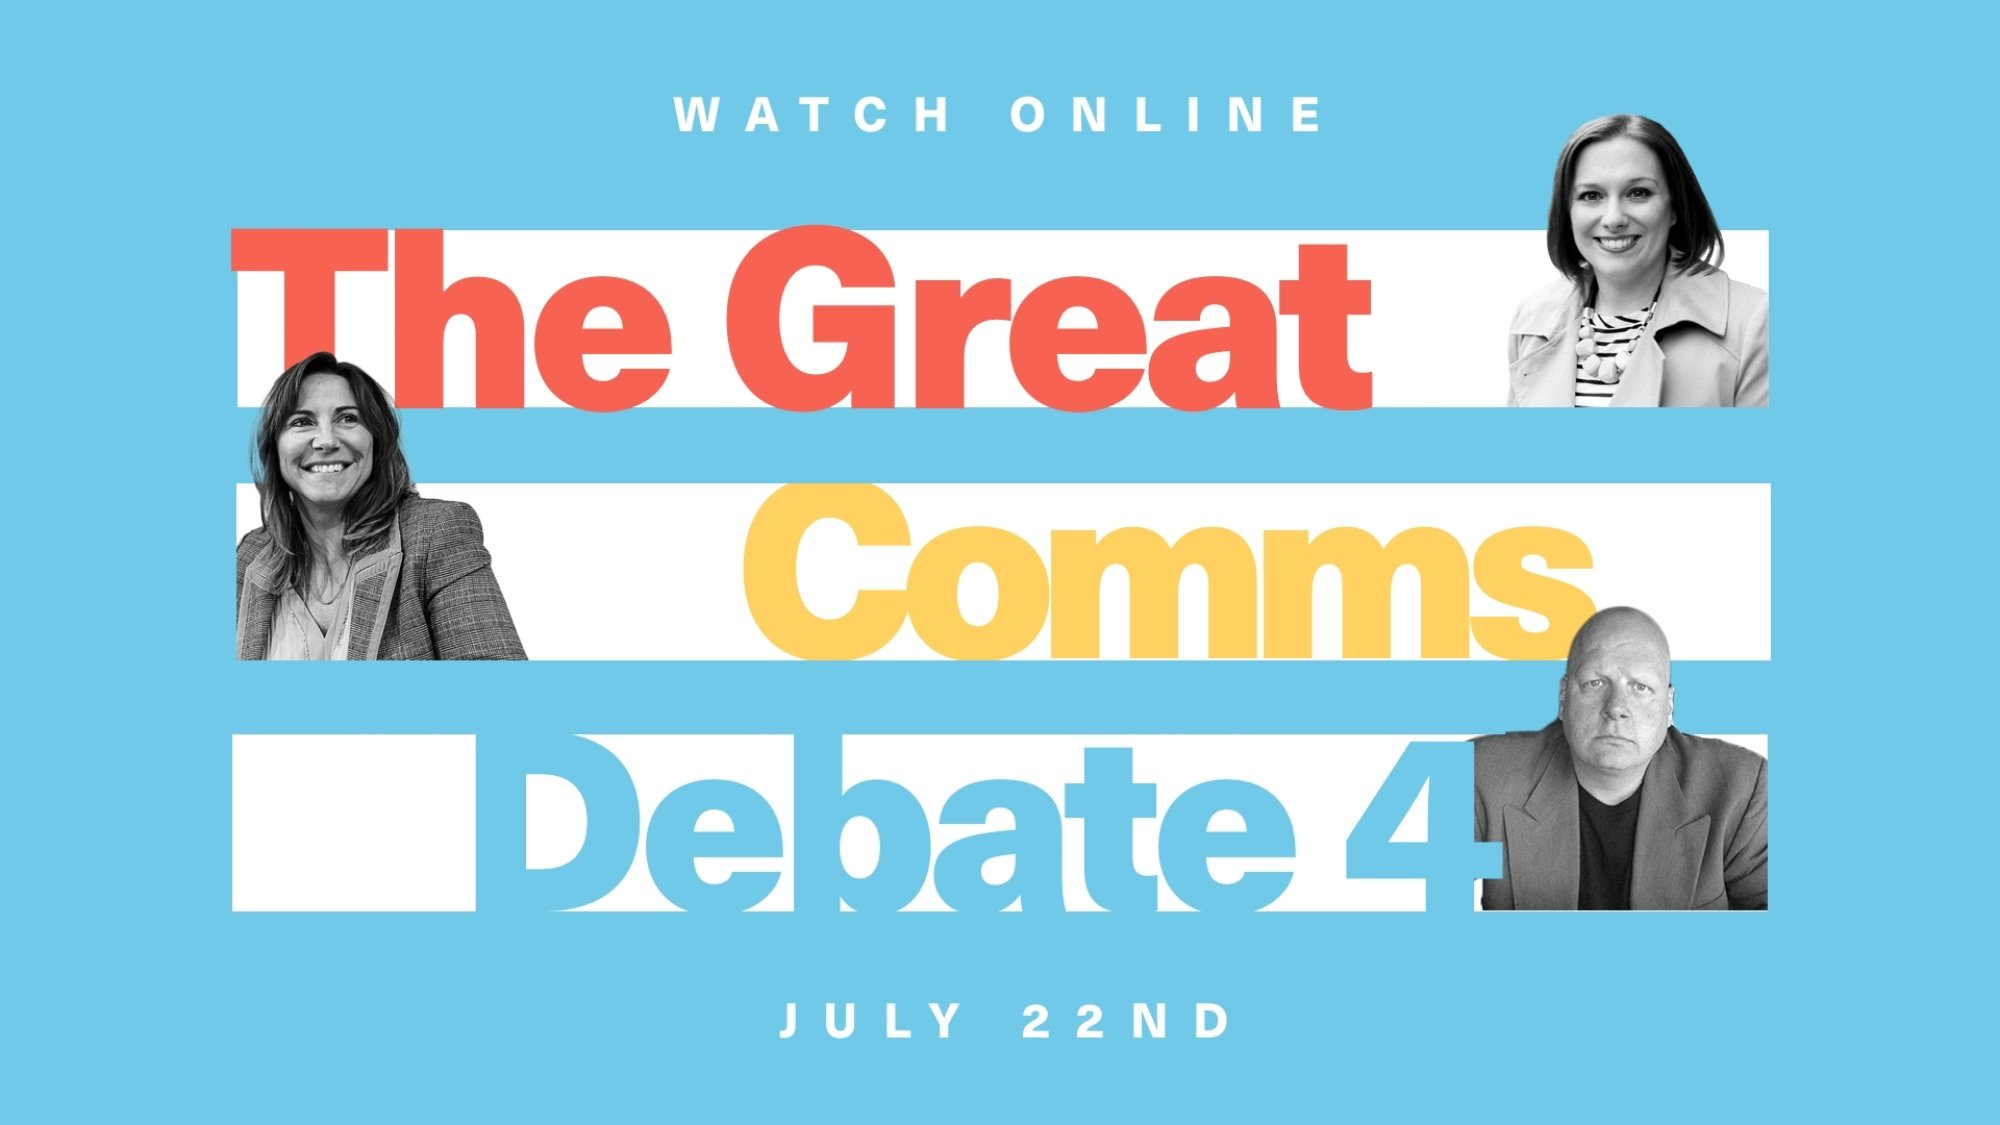 The Great Comms Debate